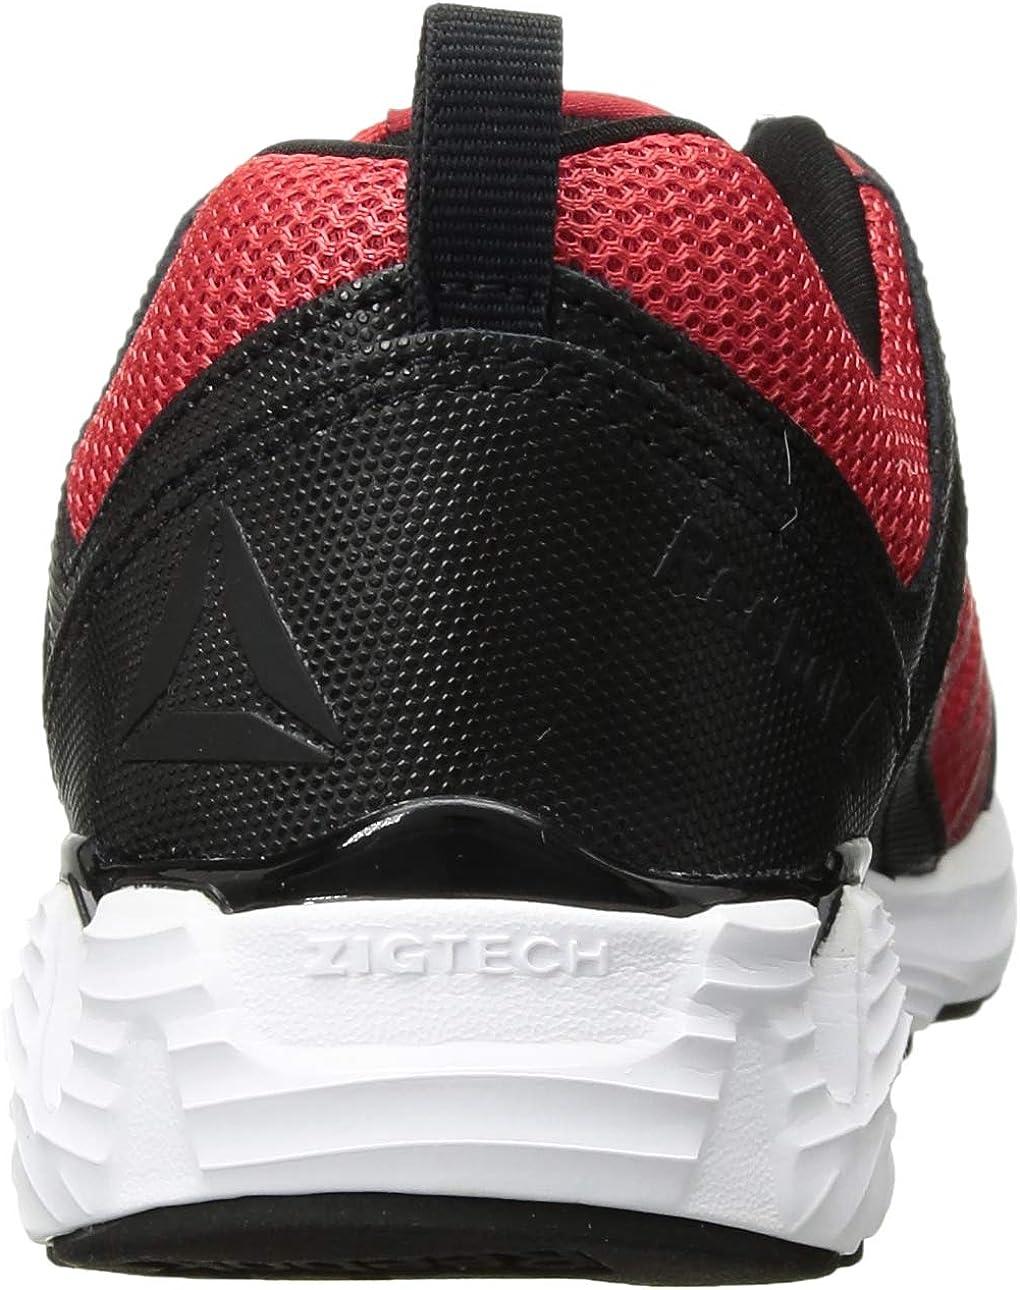 NEW IN BOX Reebok Kids/' Zigkick 2k18 Cross Trainer Size 6.5 Red//Black//white